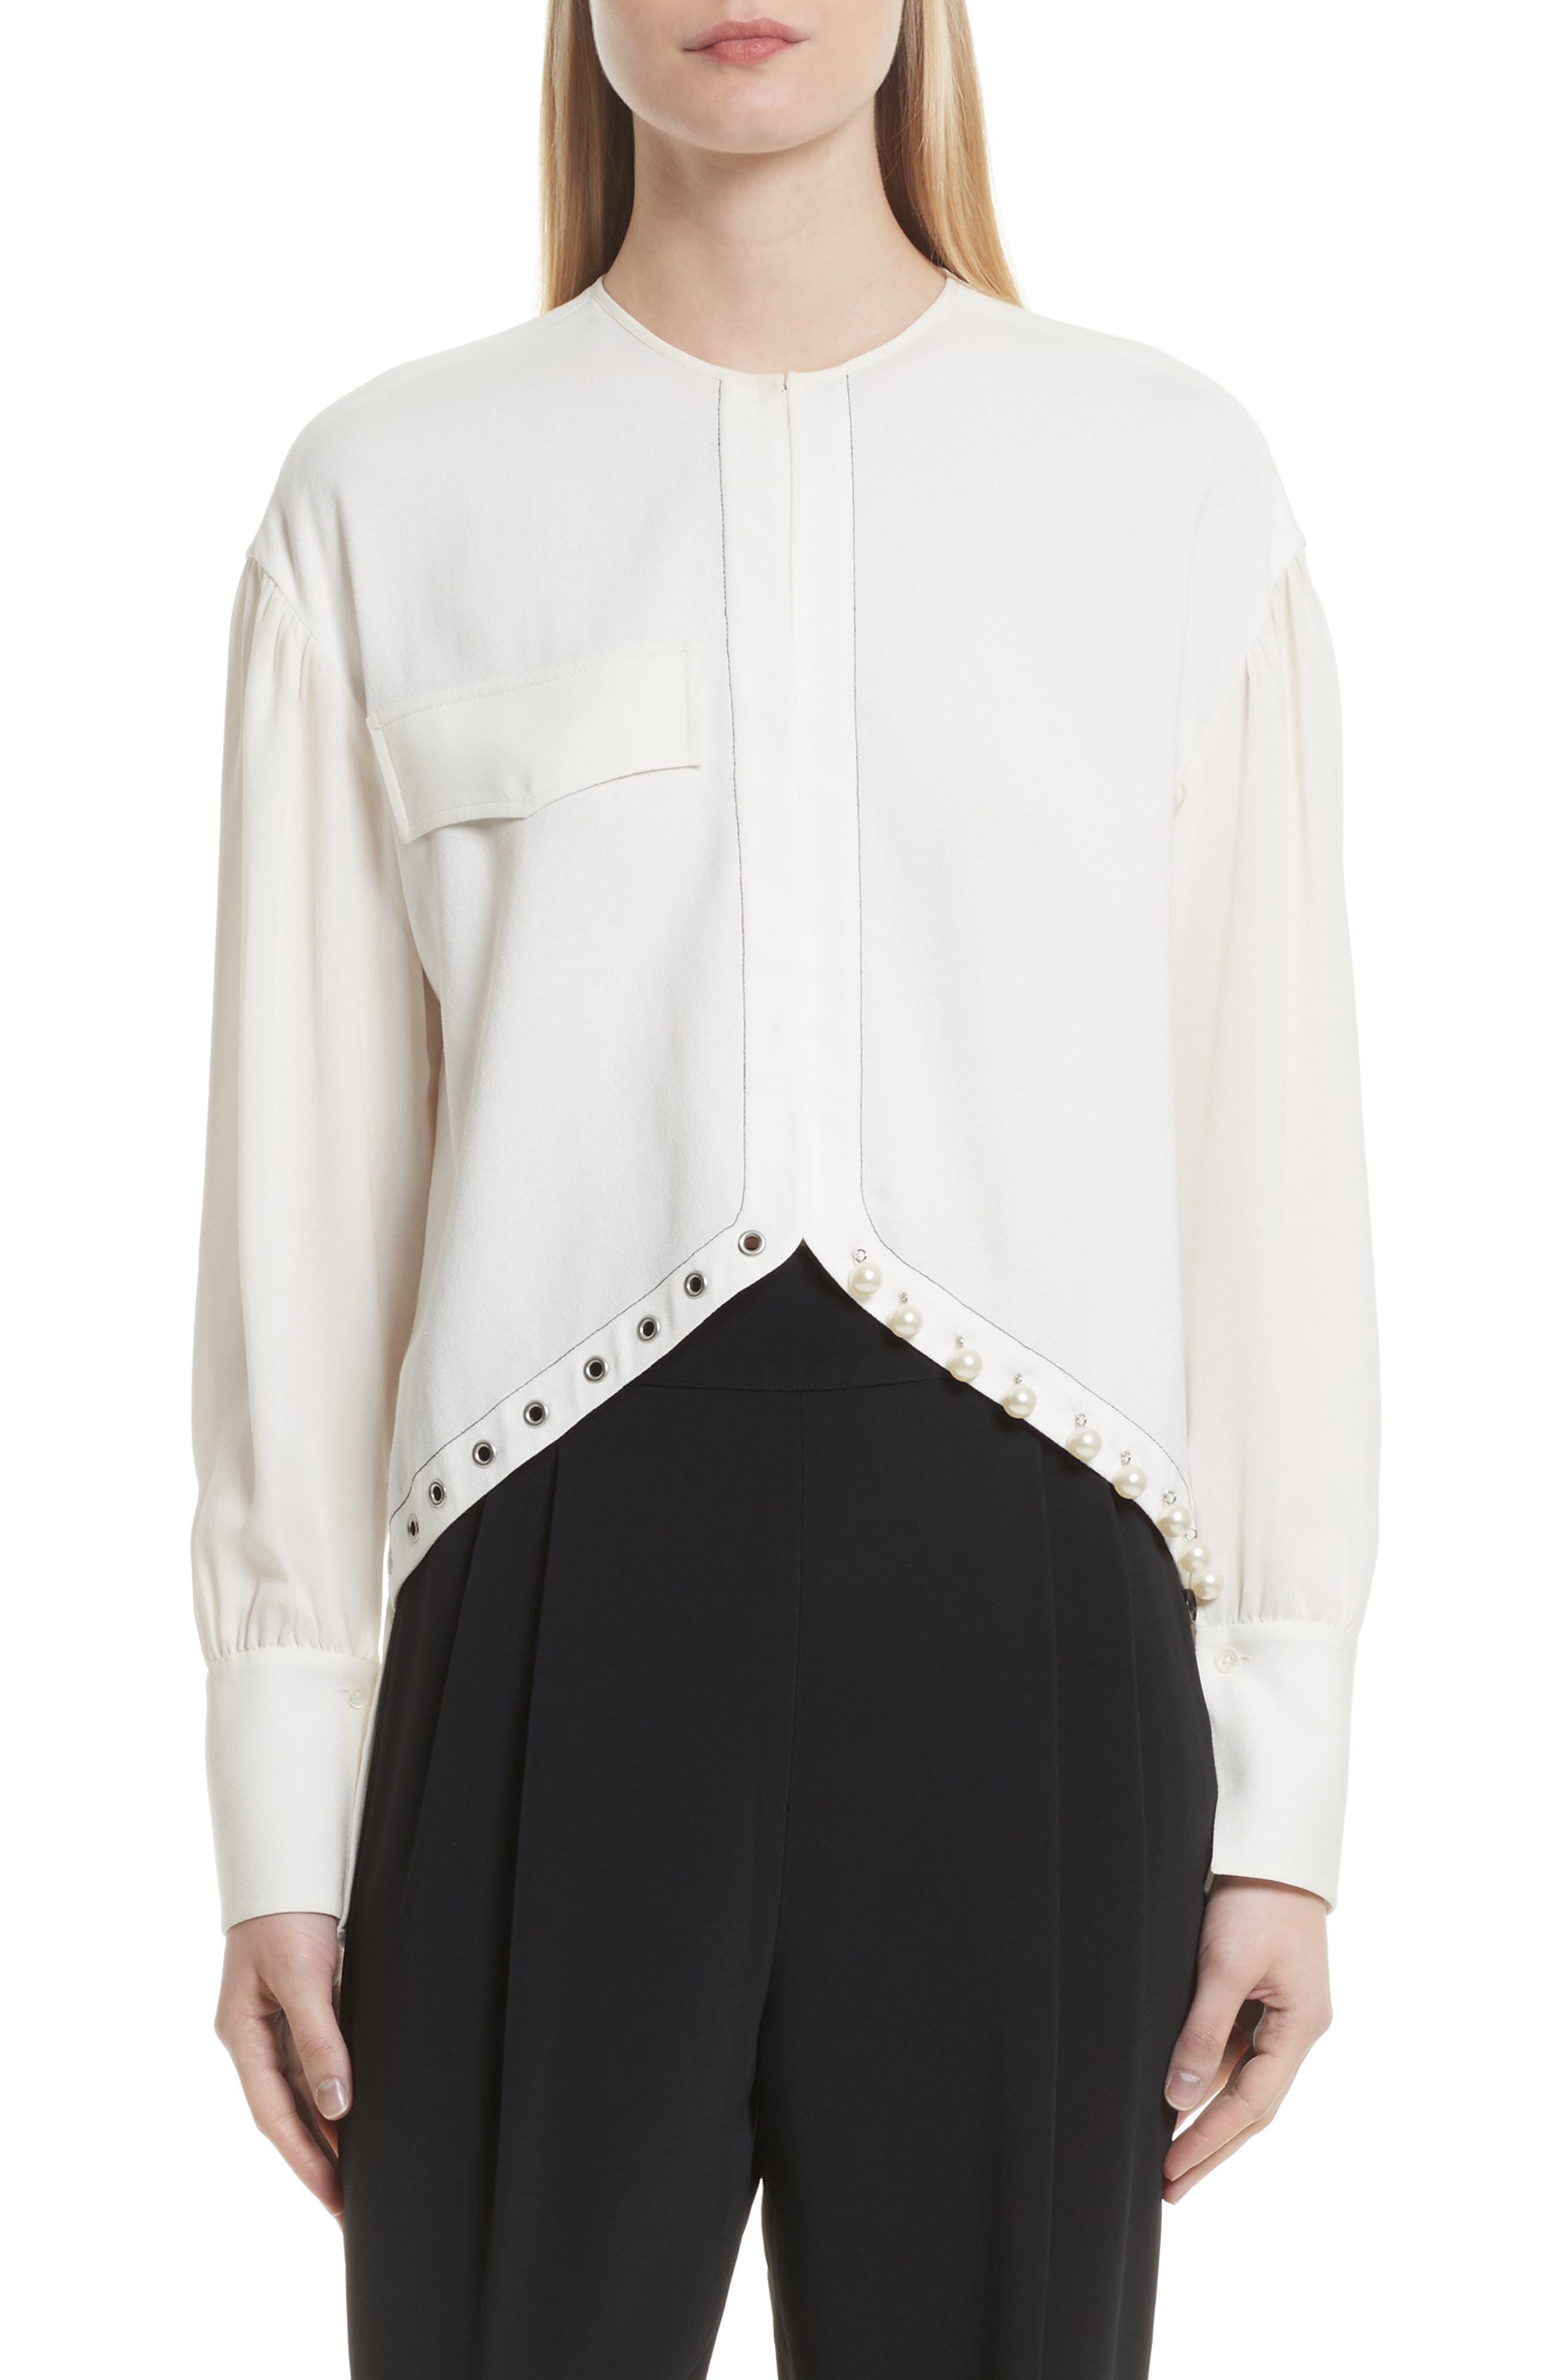 3.1 Phillip Lim Faux Pearl & Grommet Embellished Shirt